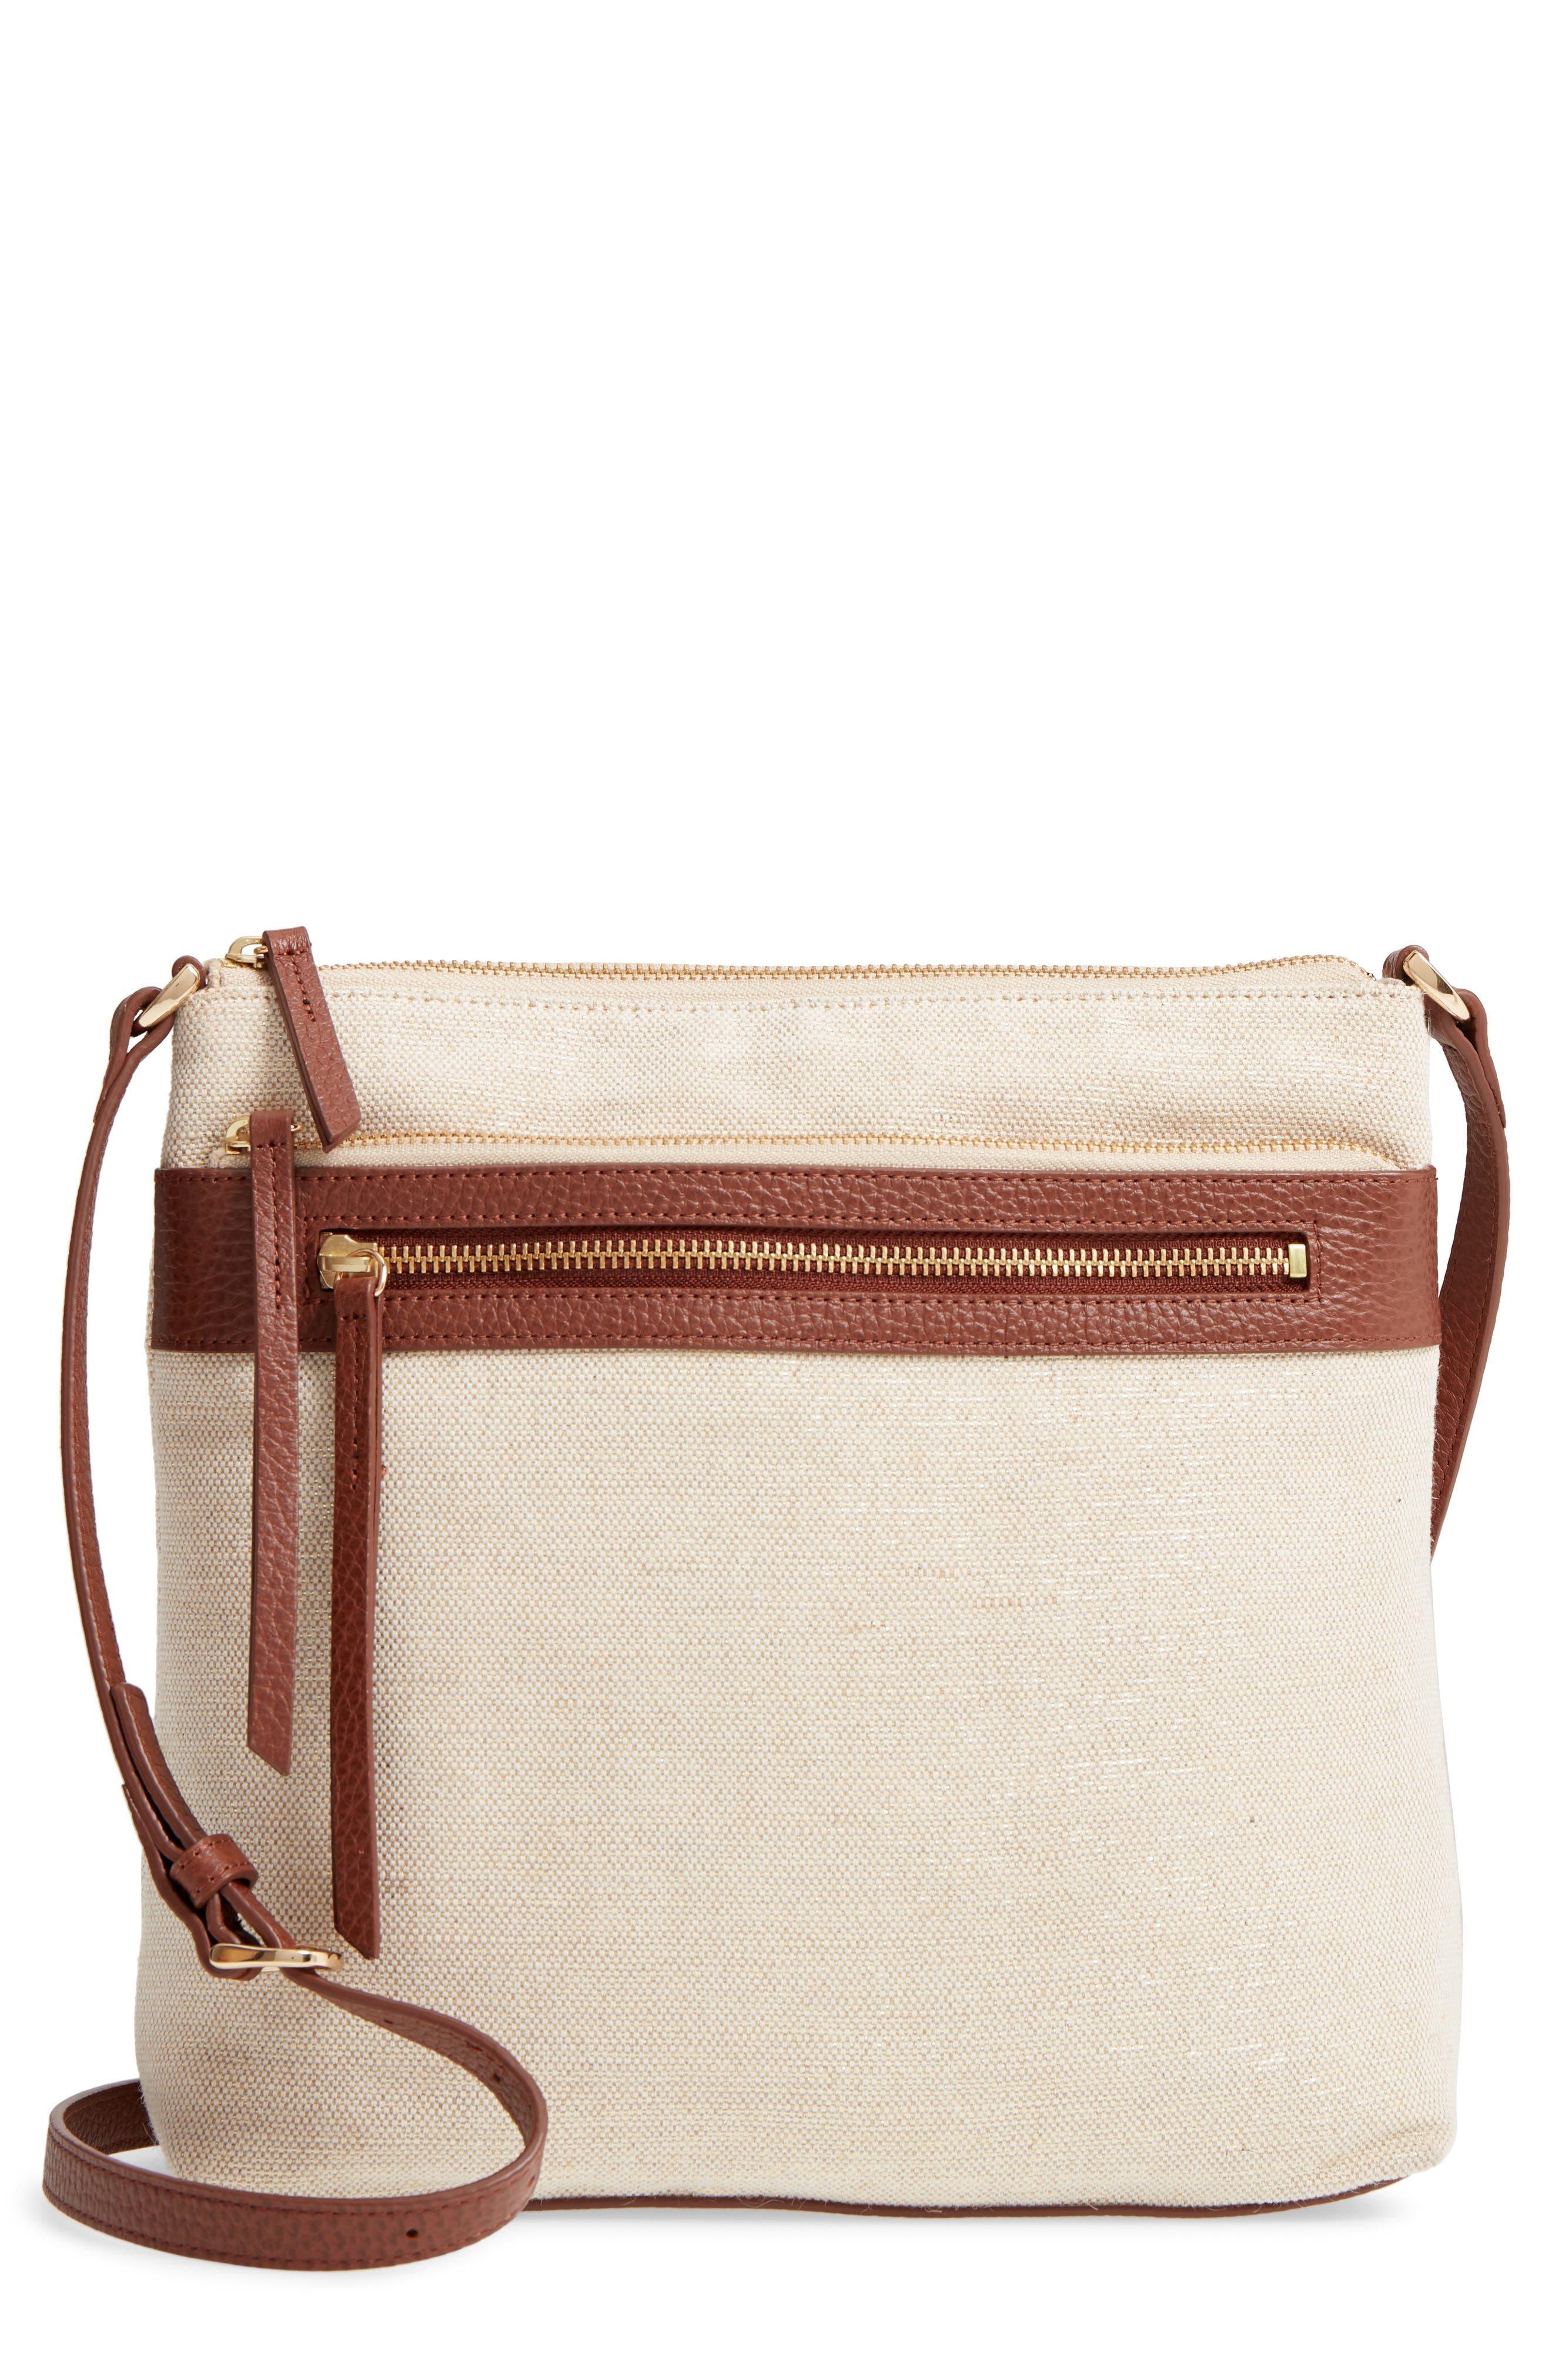 Kaison Linen & Leather Crossbody Bag,                             Main thumbnail 1, color,                             NATURAL/ GOLD